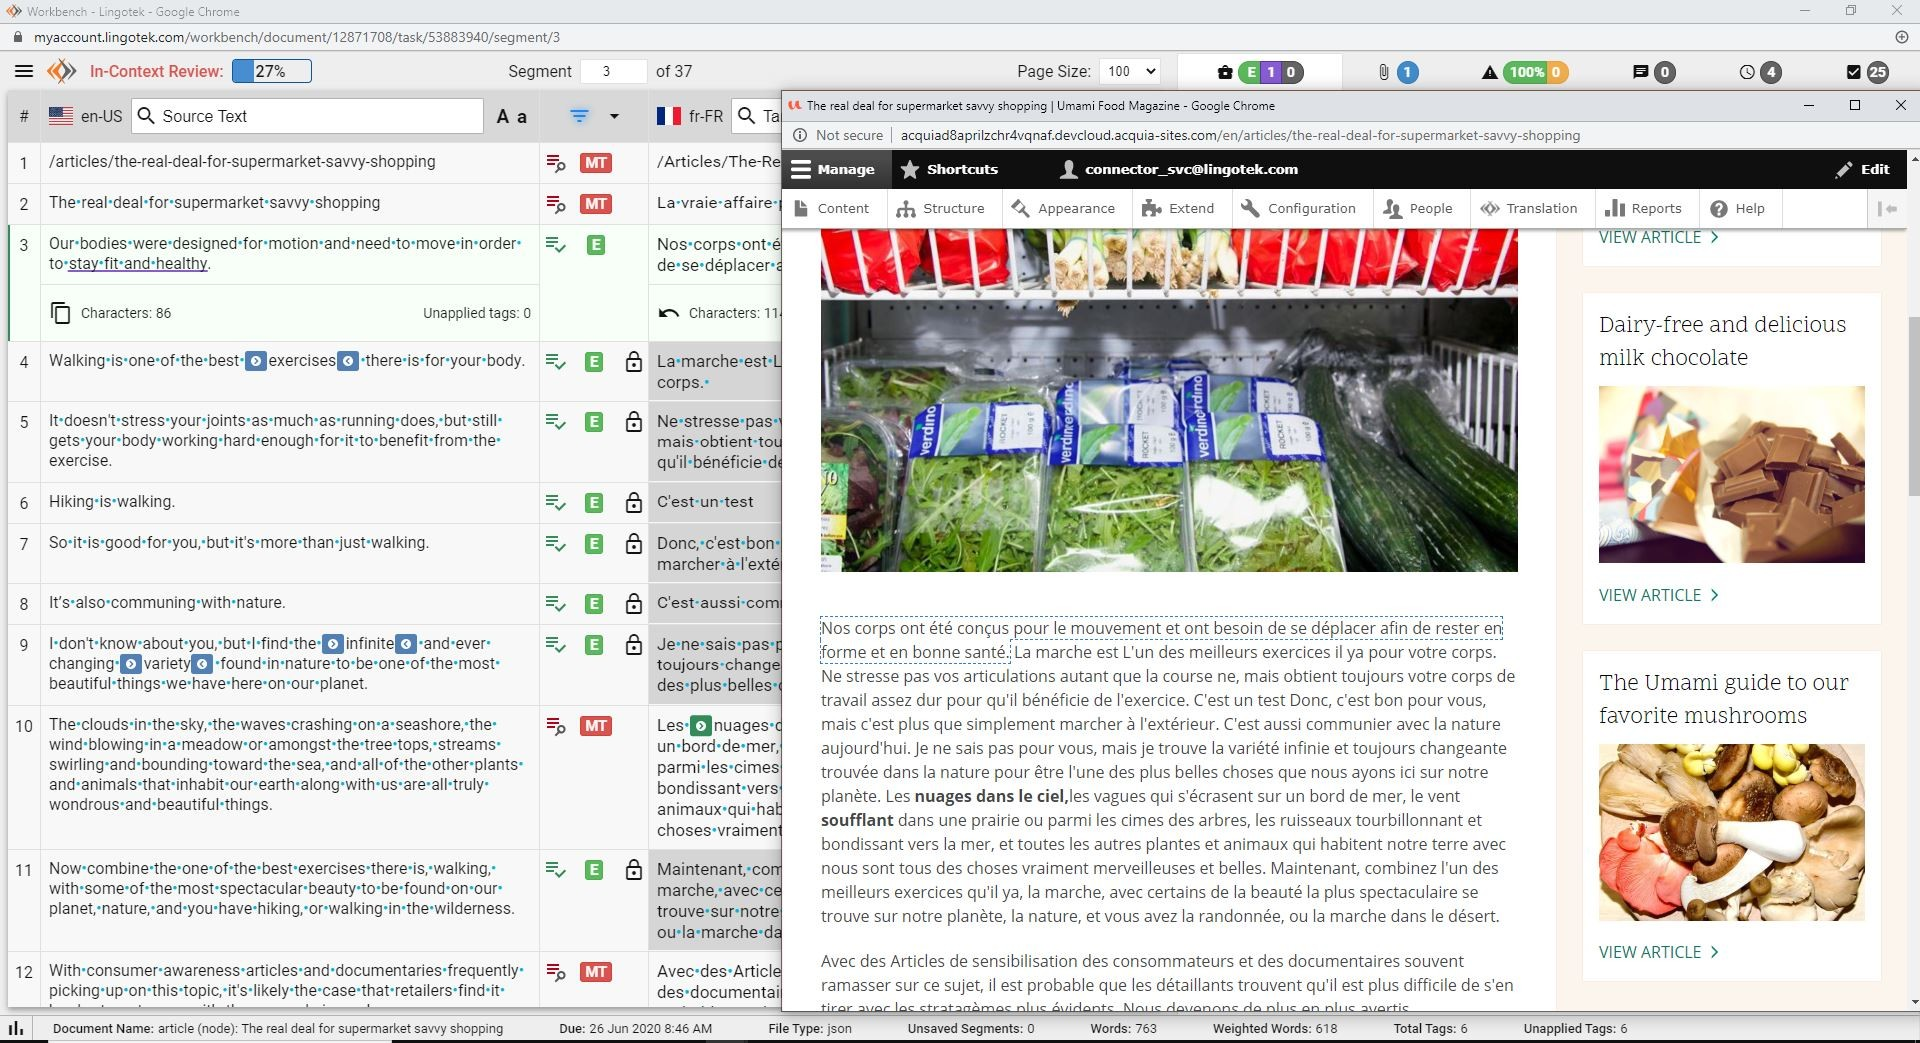 dual-monitor screenshot of Lingotek's in-context translation editor